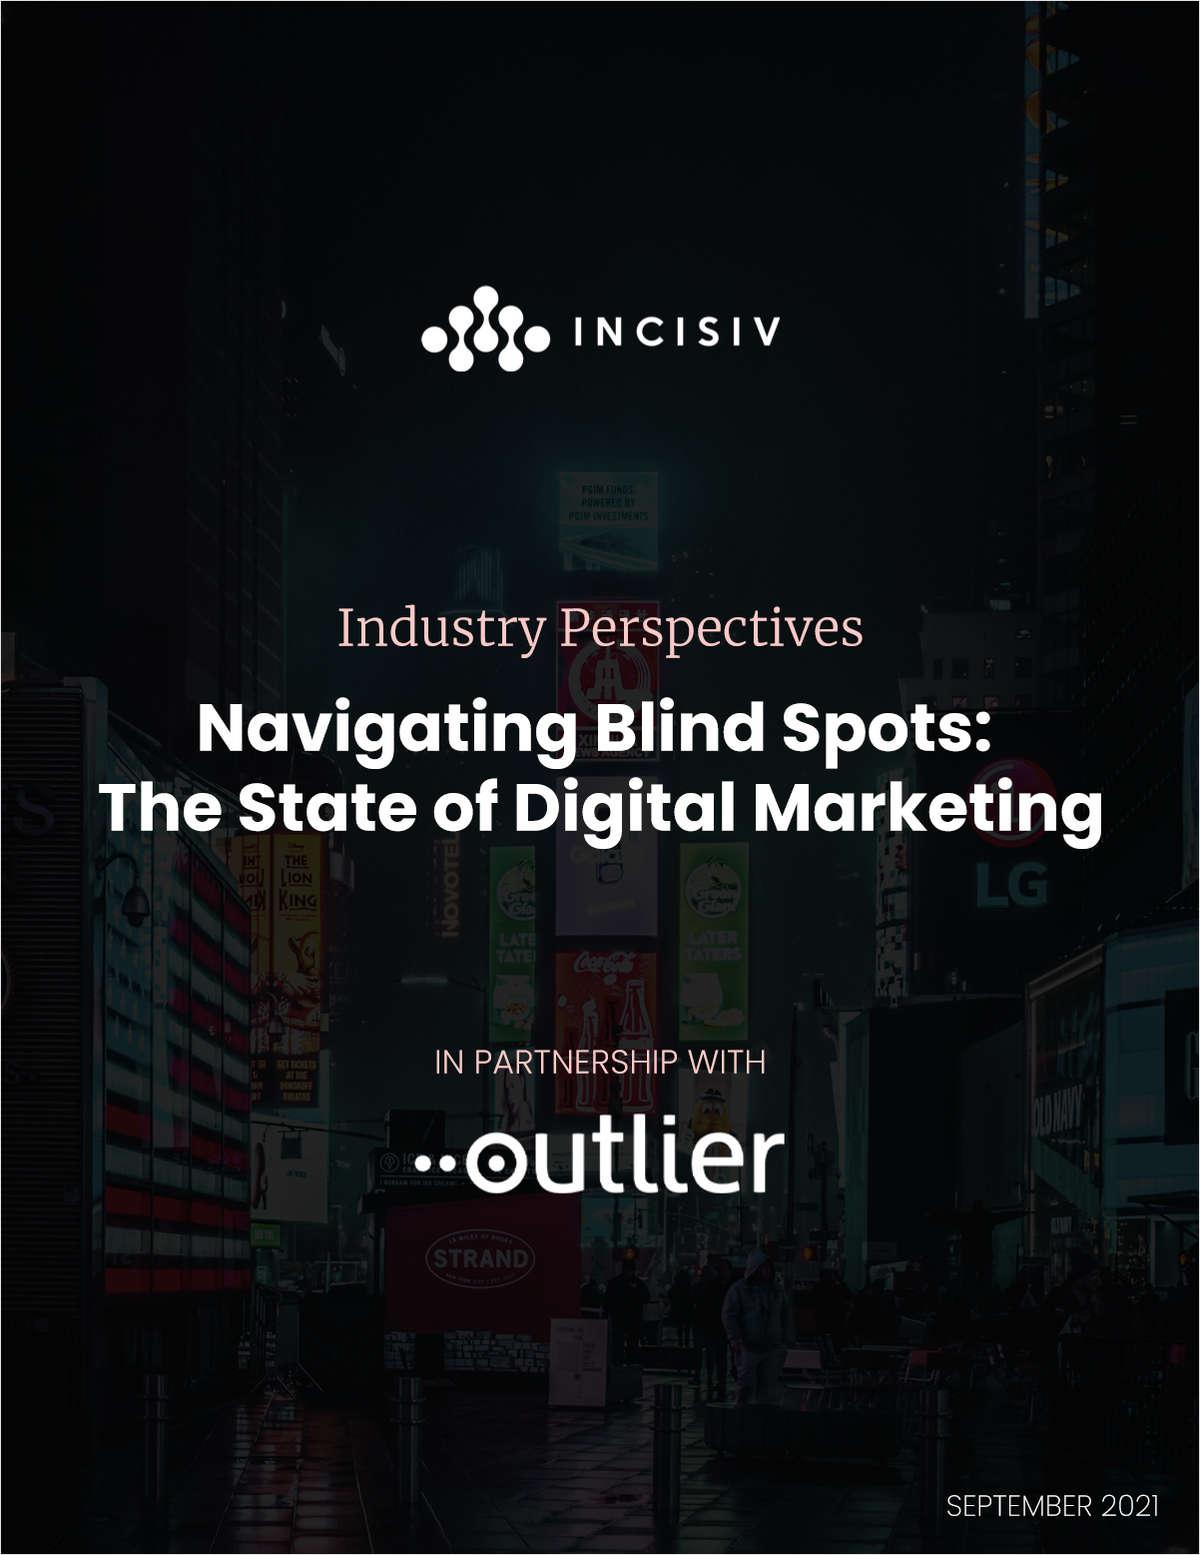 Navigating Blind Spots: The State of Digital Marketing